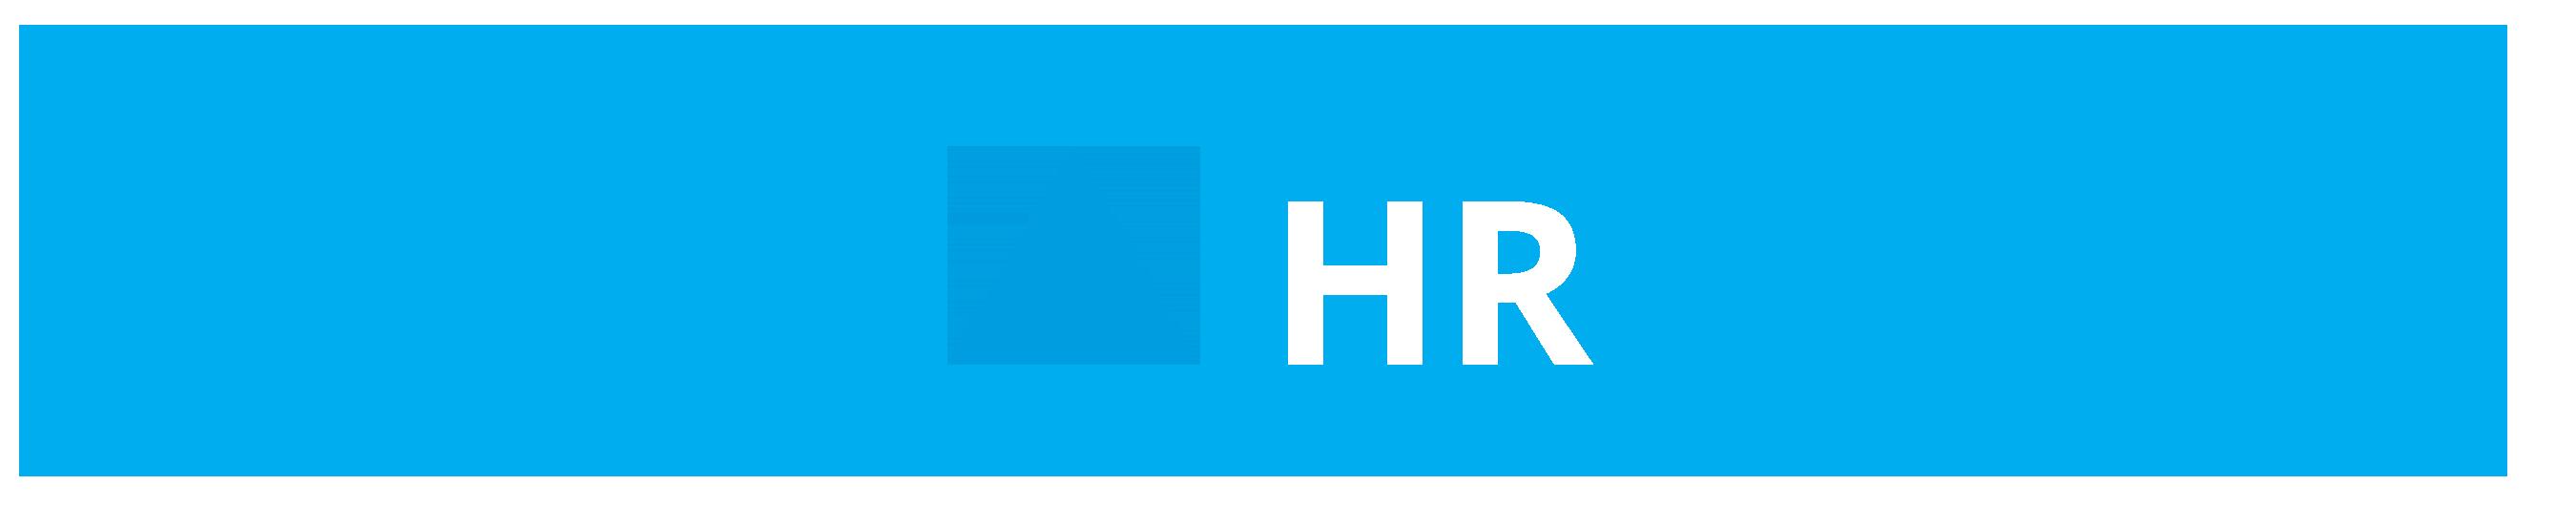 HR_TP